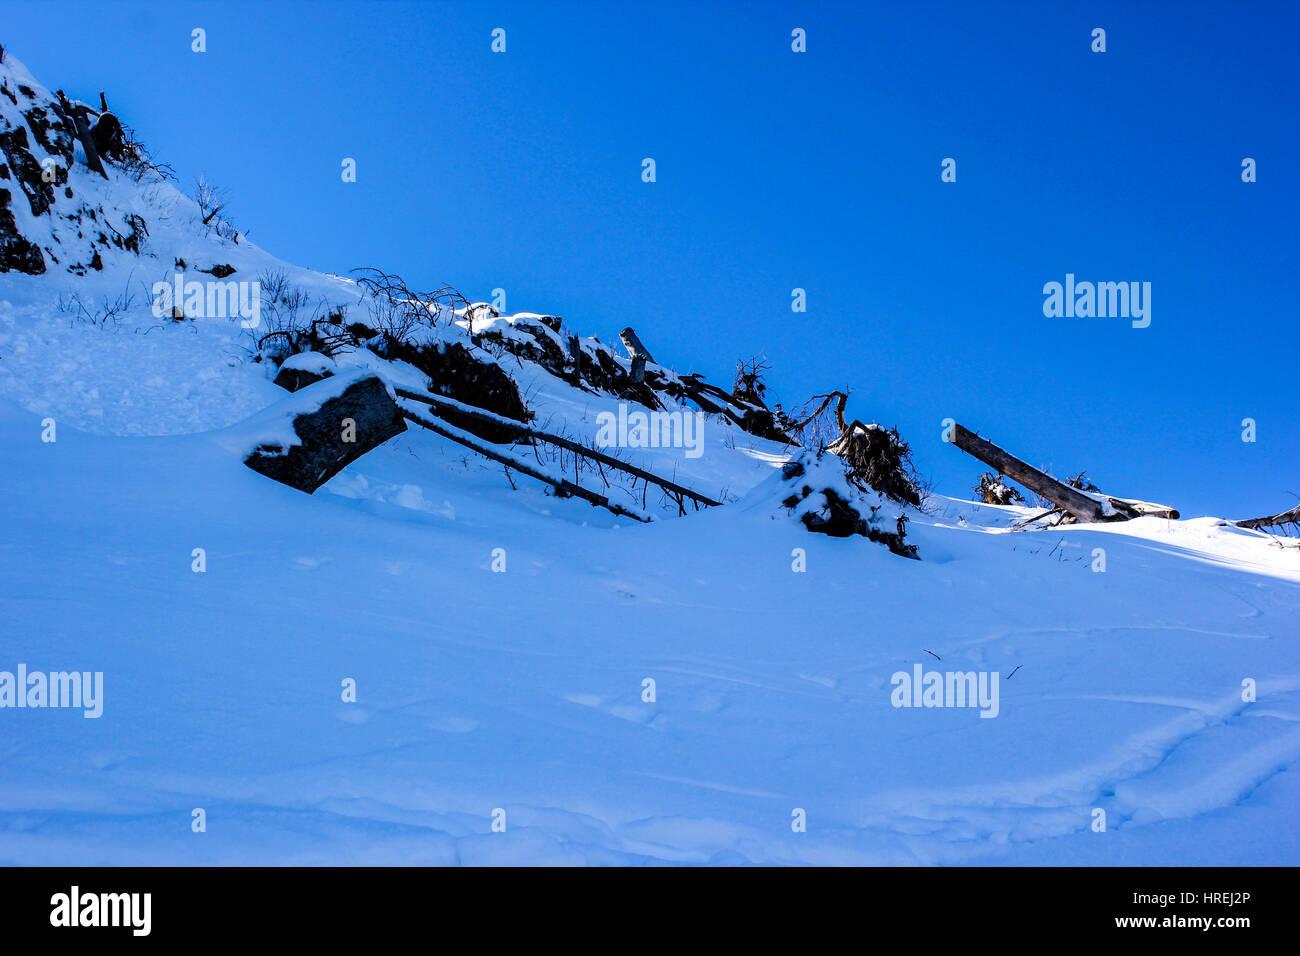 Winterlandschaft - winter wonderland - Stock Image